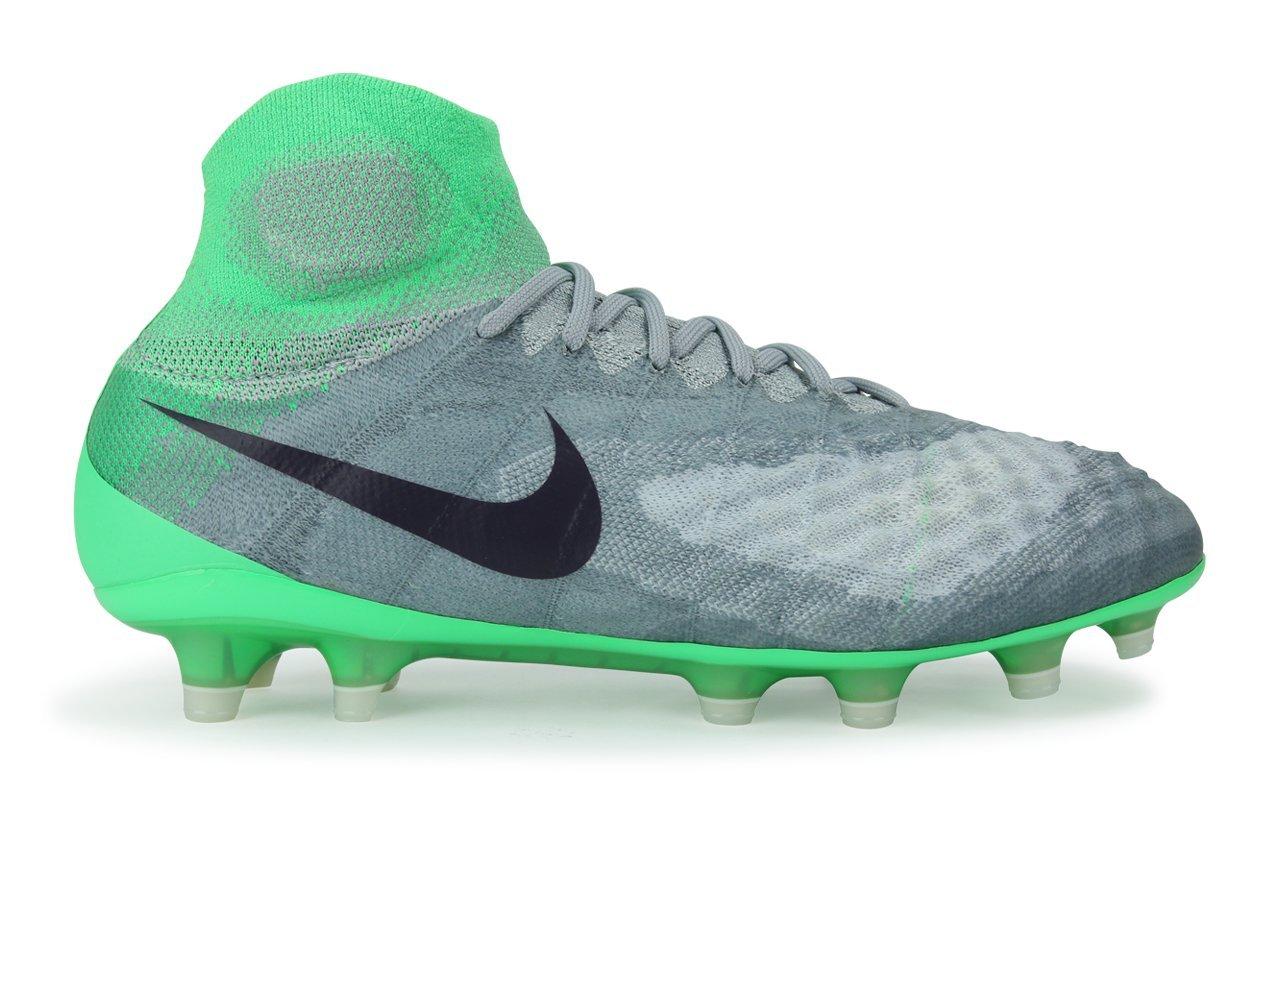 Nike Women's Magista Obra II FG Wolf Grey/Purple Dynasty/Electric Green Soccer Shoes - 6A